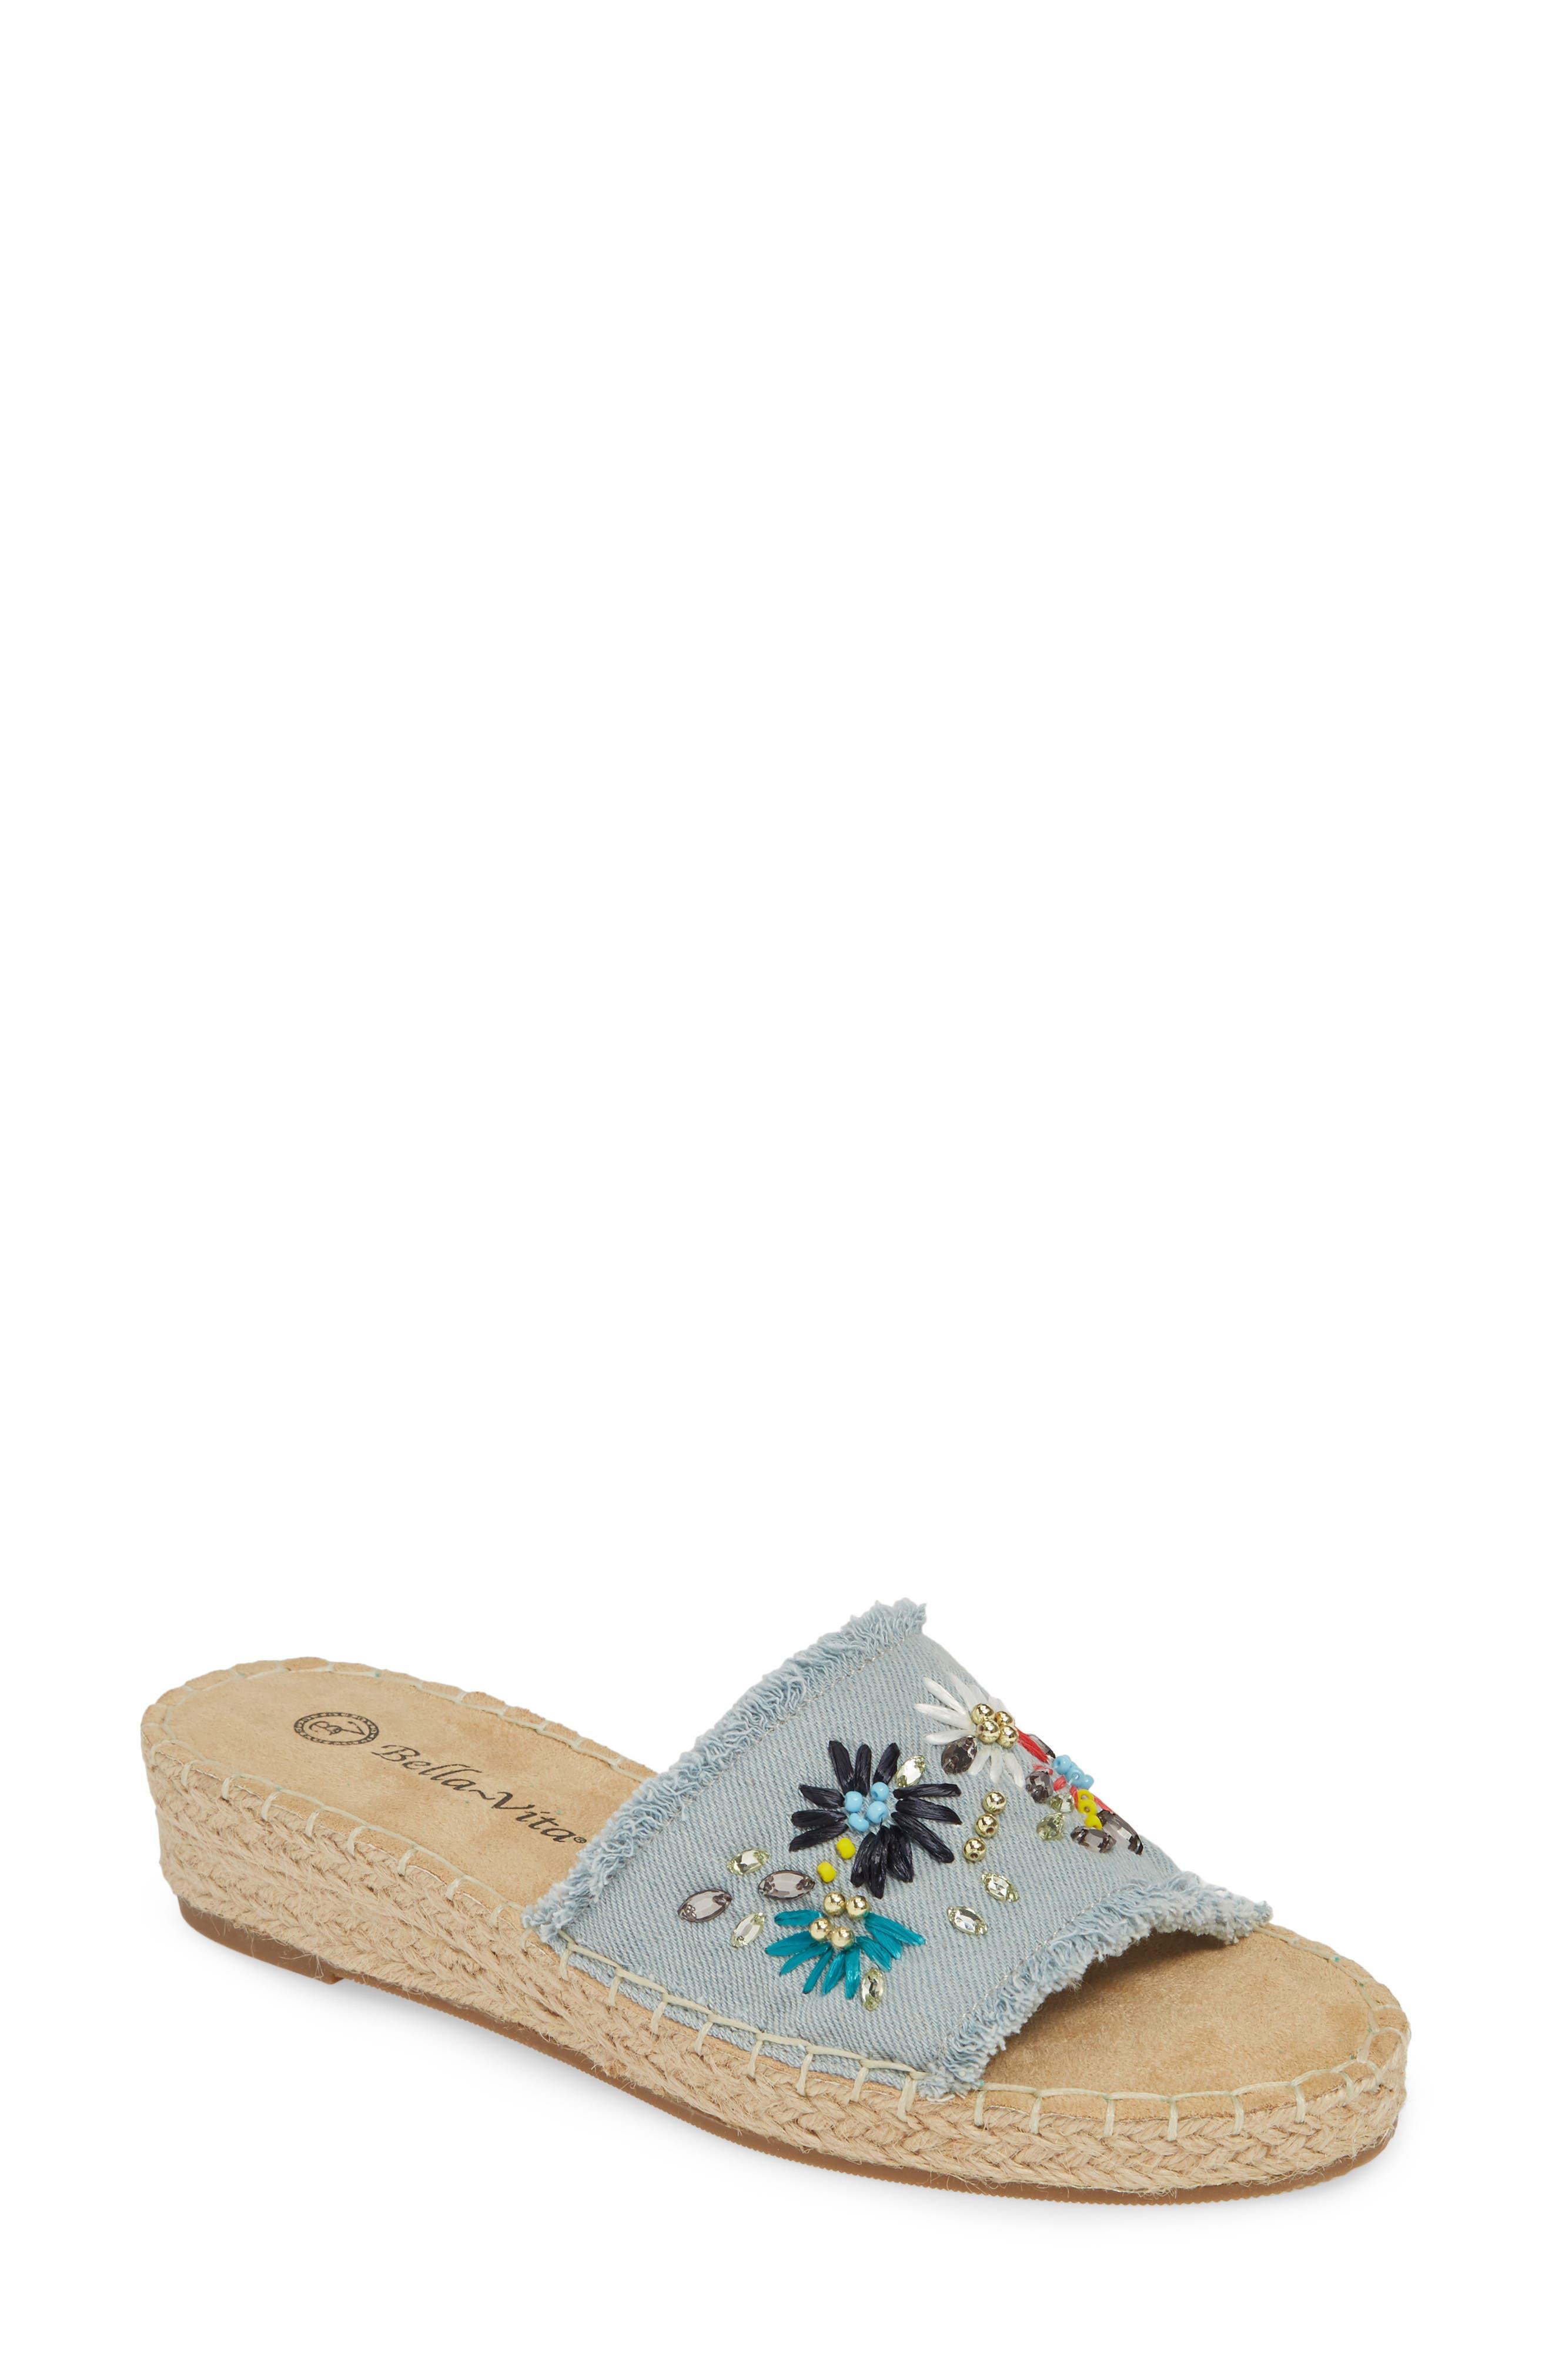 994a298b8a7 Bella Vita Cher Ii Slide Sandal W - Blue